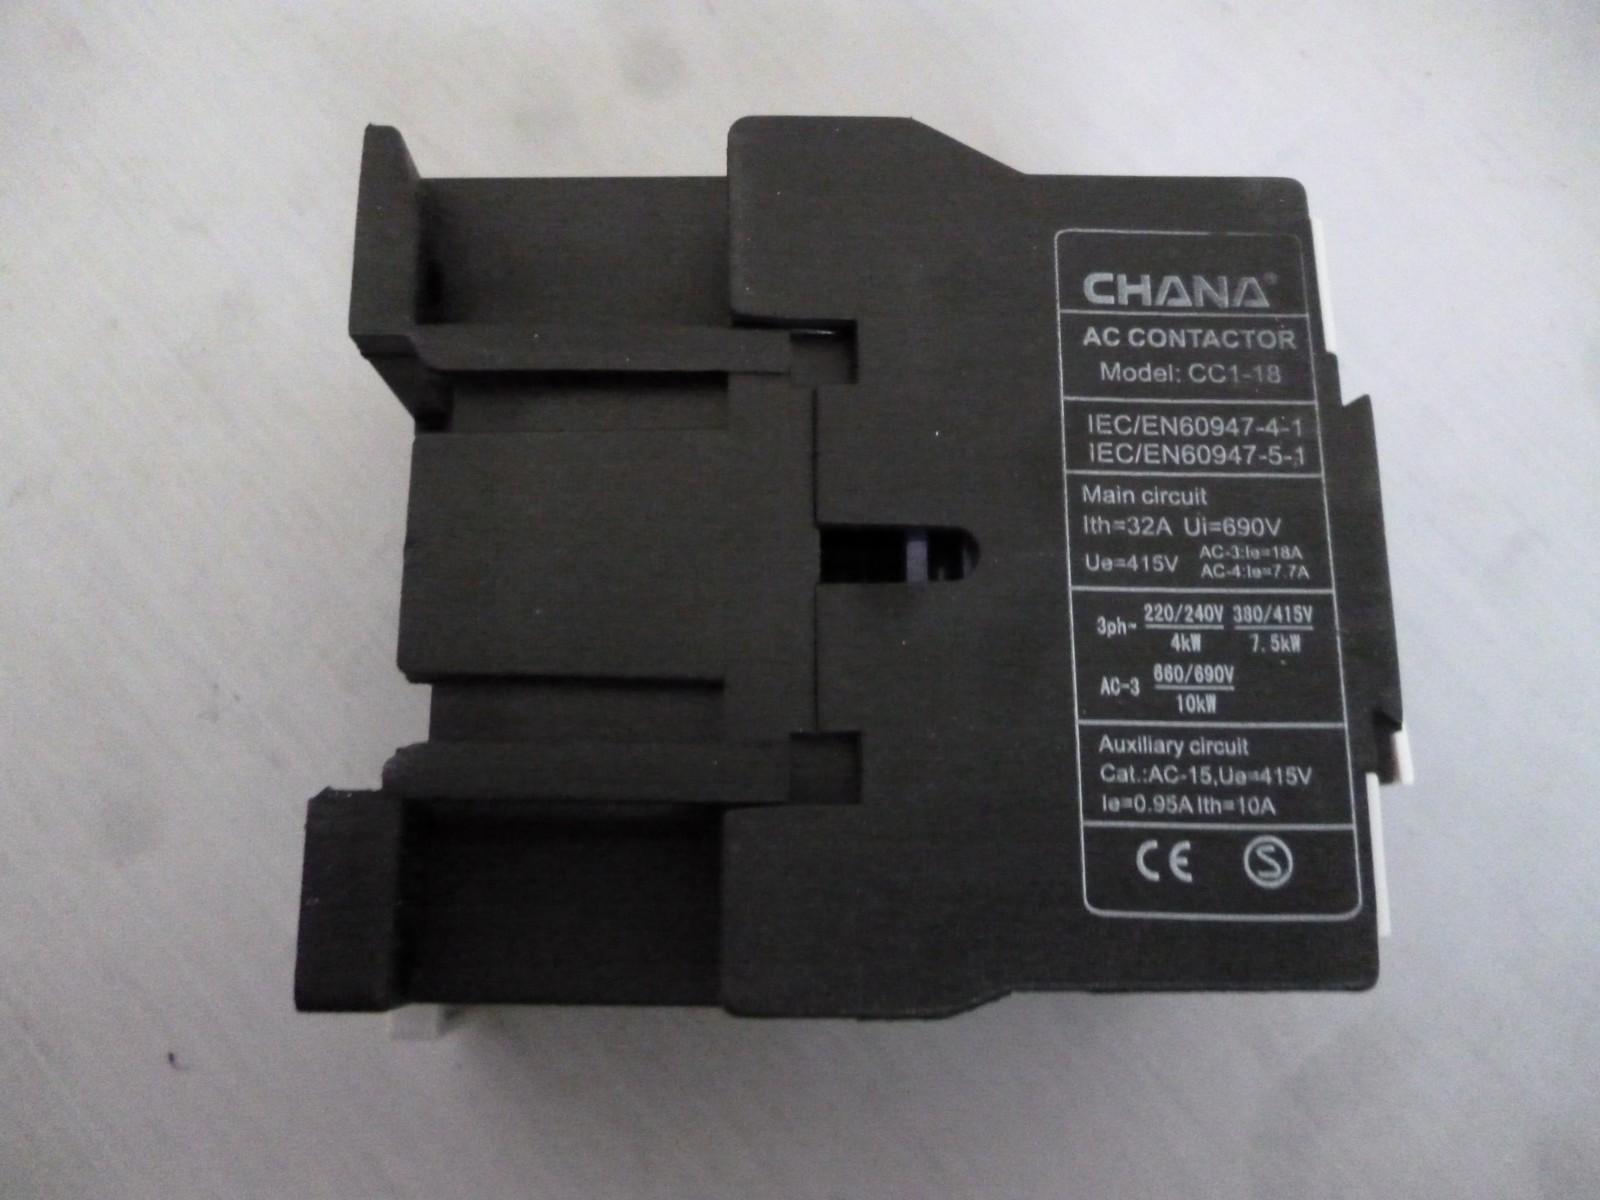 Chana CC1-1810 3 Pole Contactor